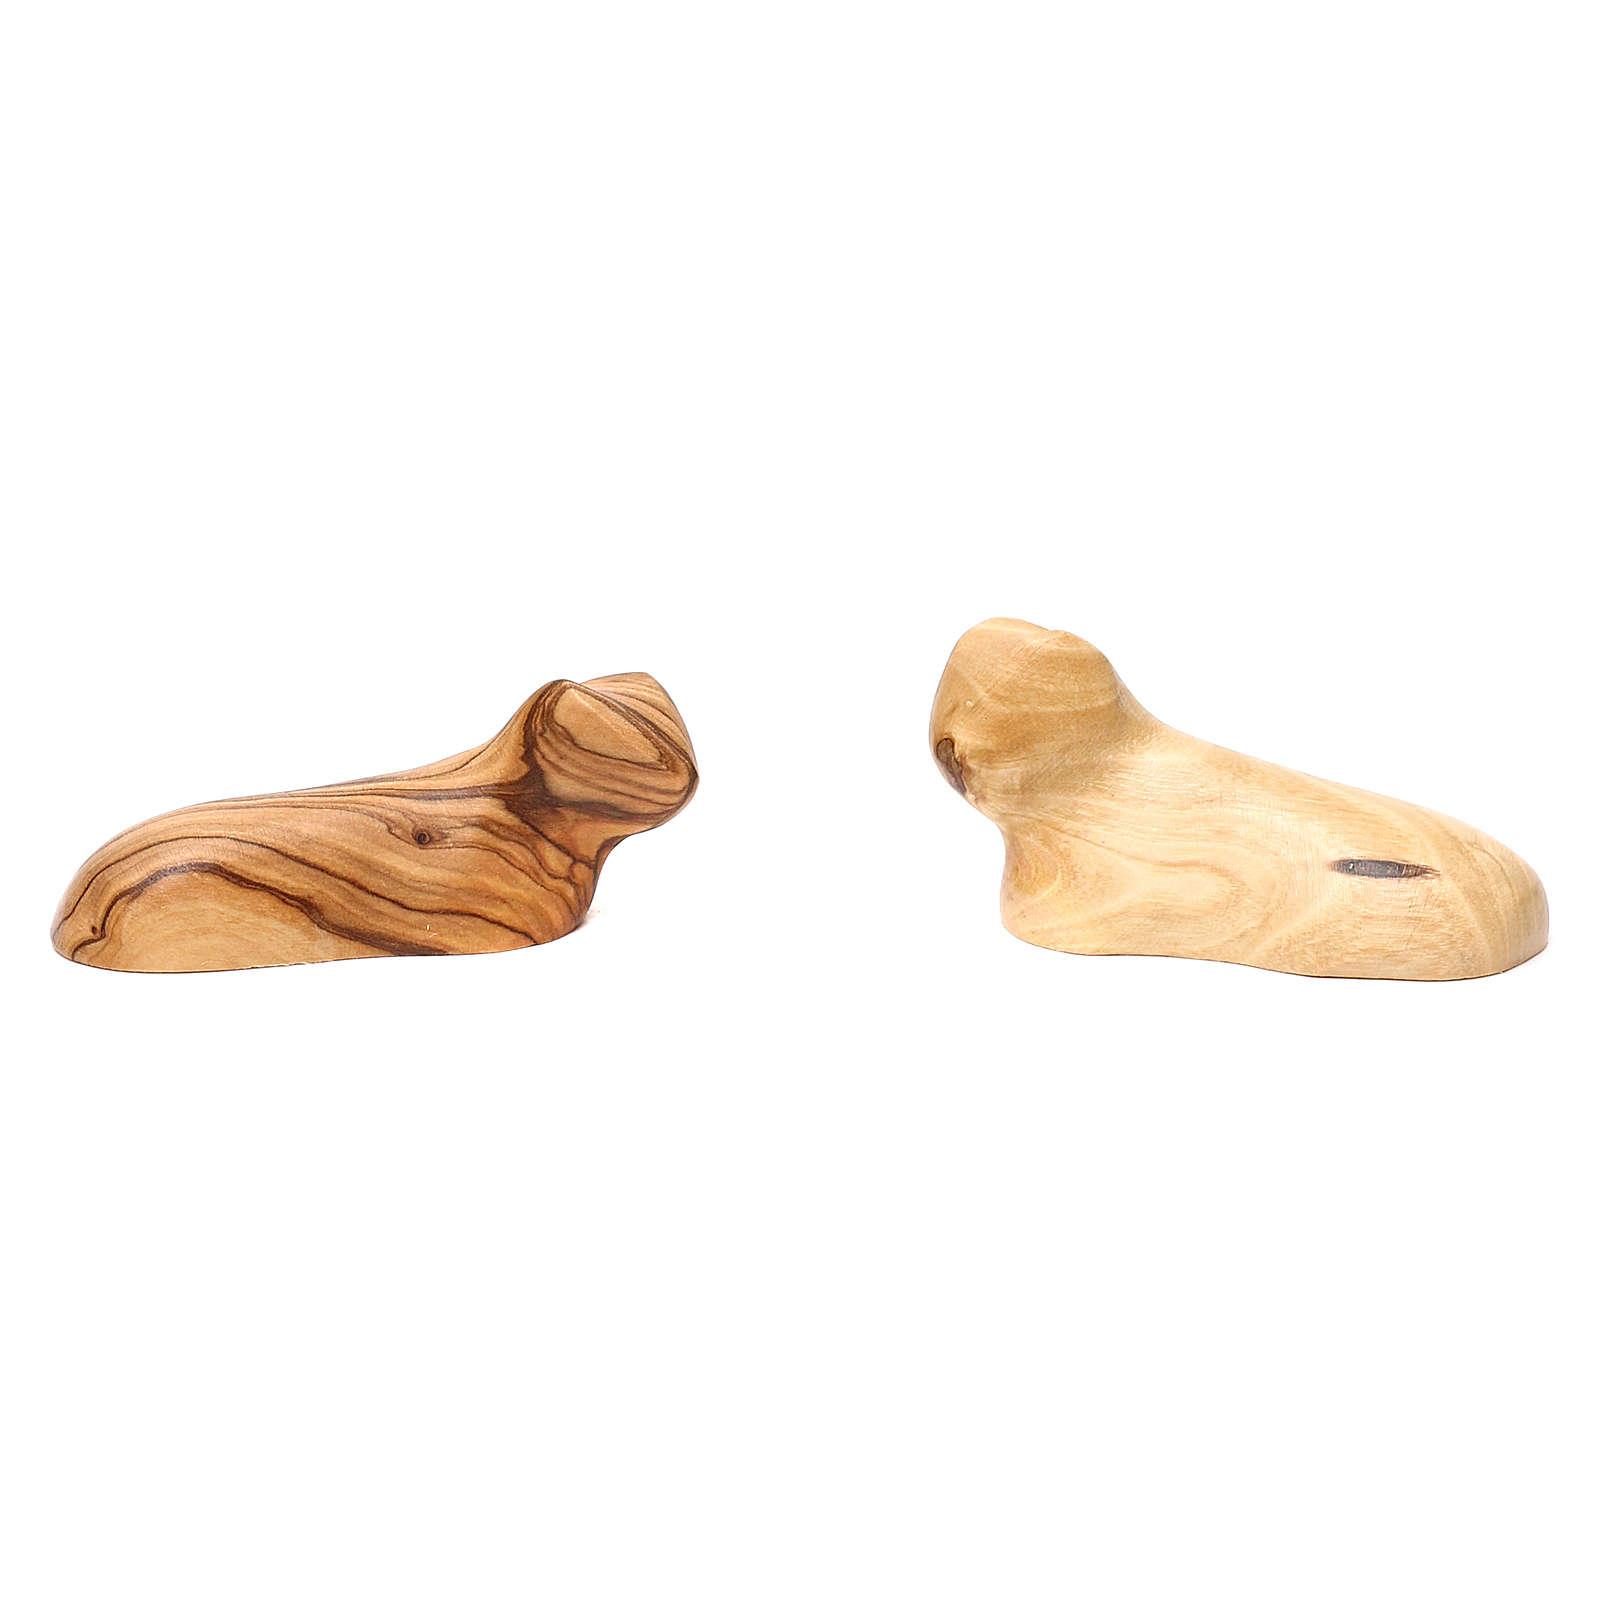 Capanna con presepe in ulivo di Betlemme 20x30x20 cm 4